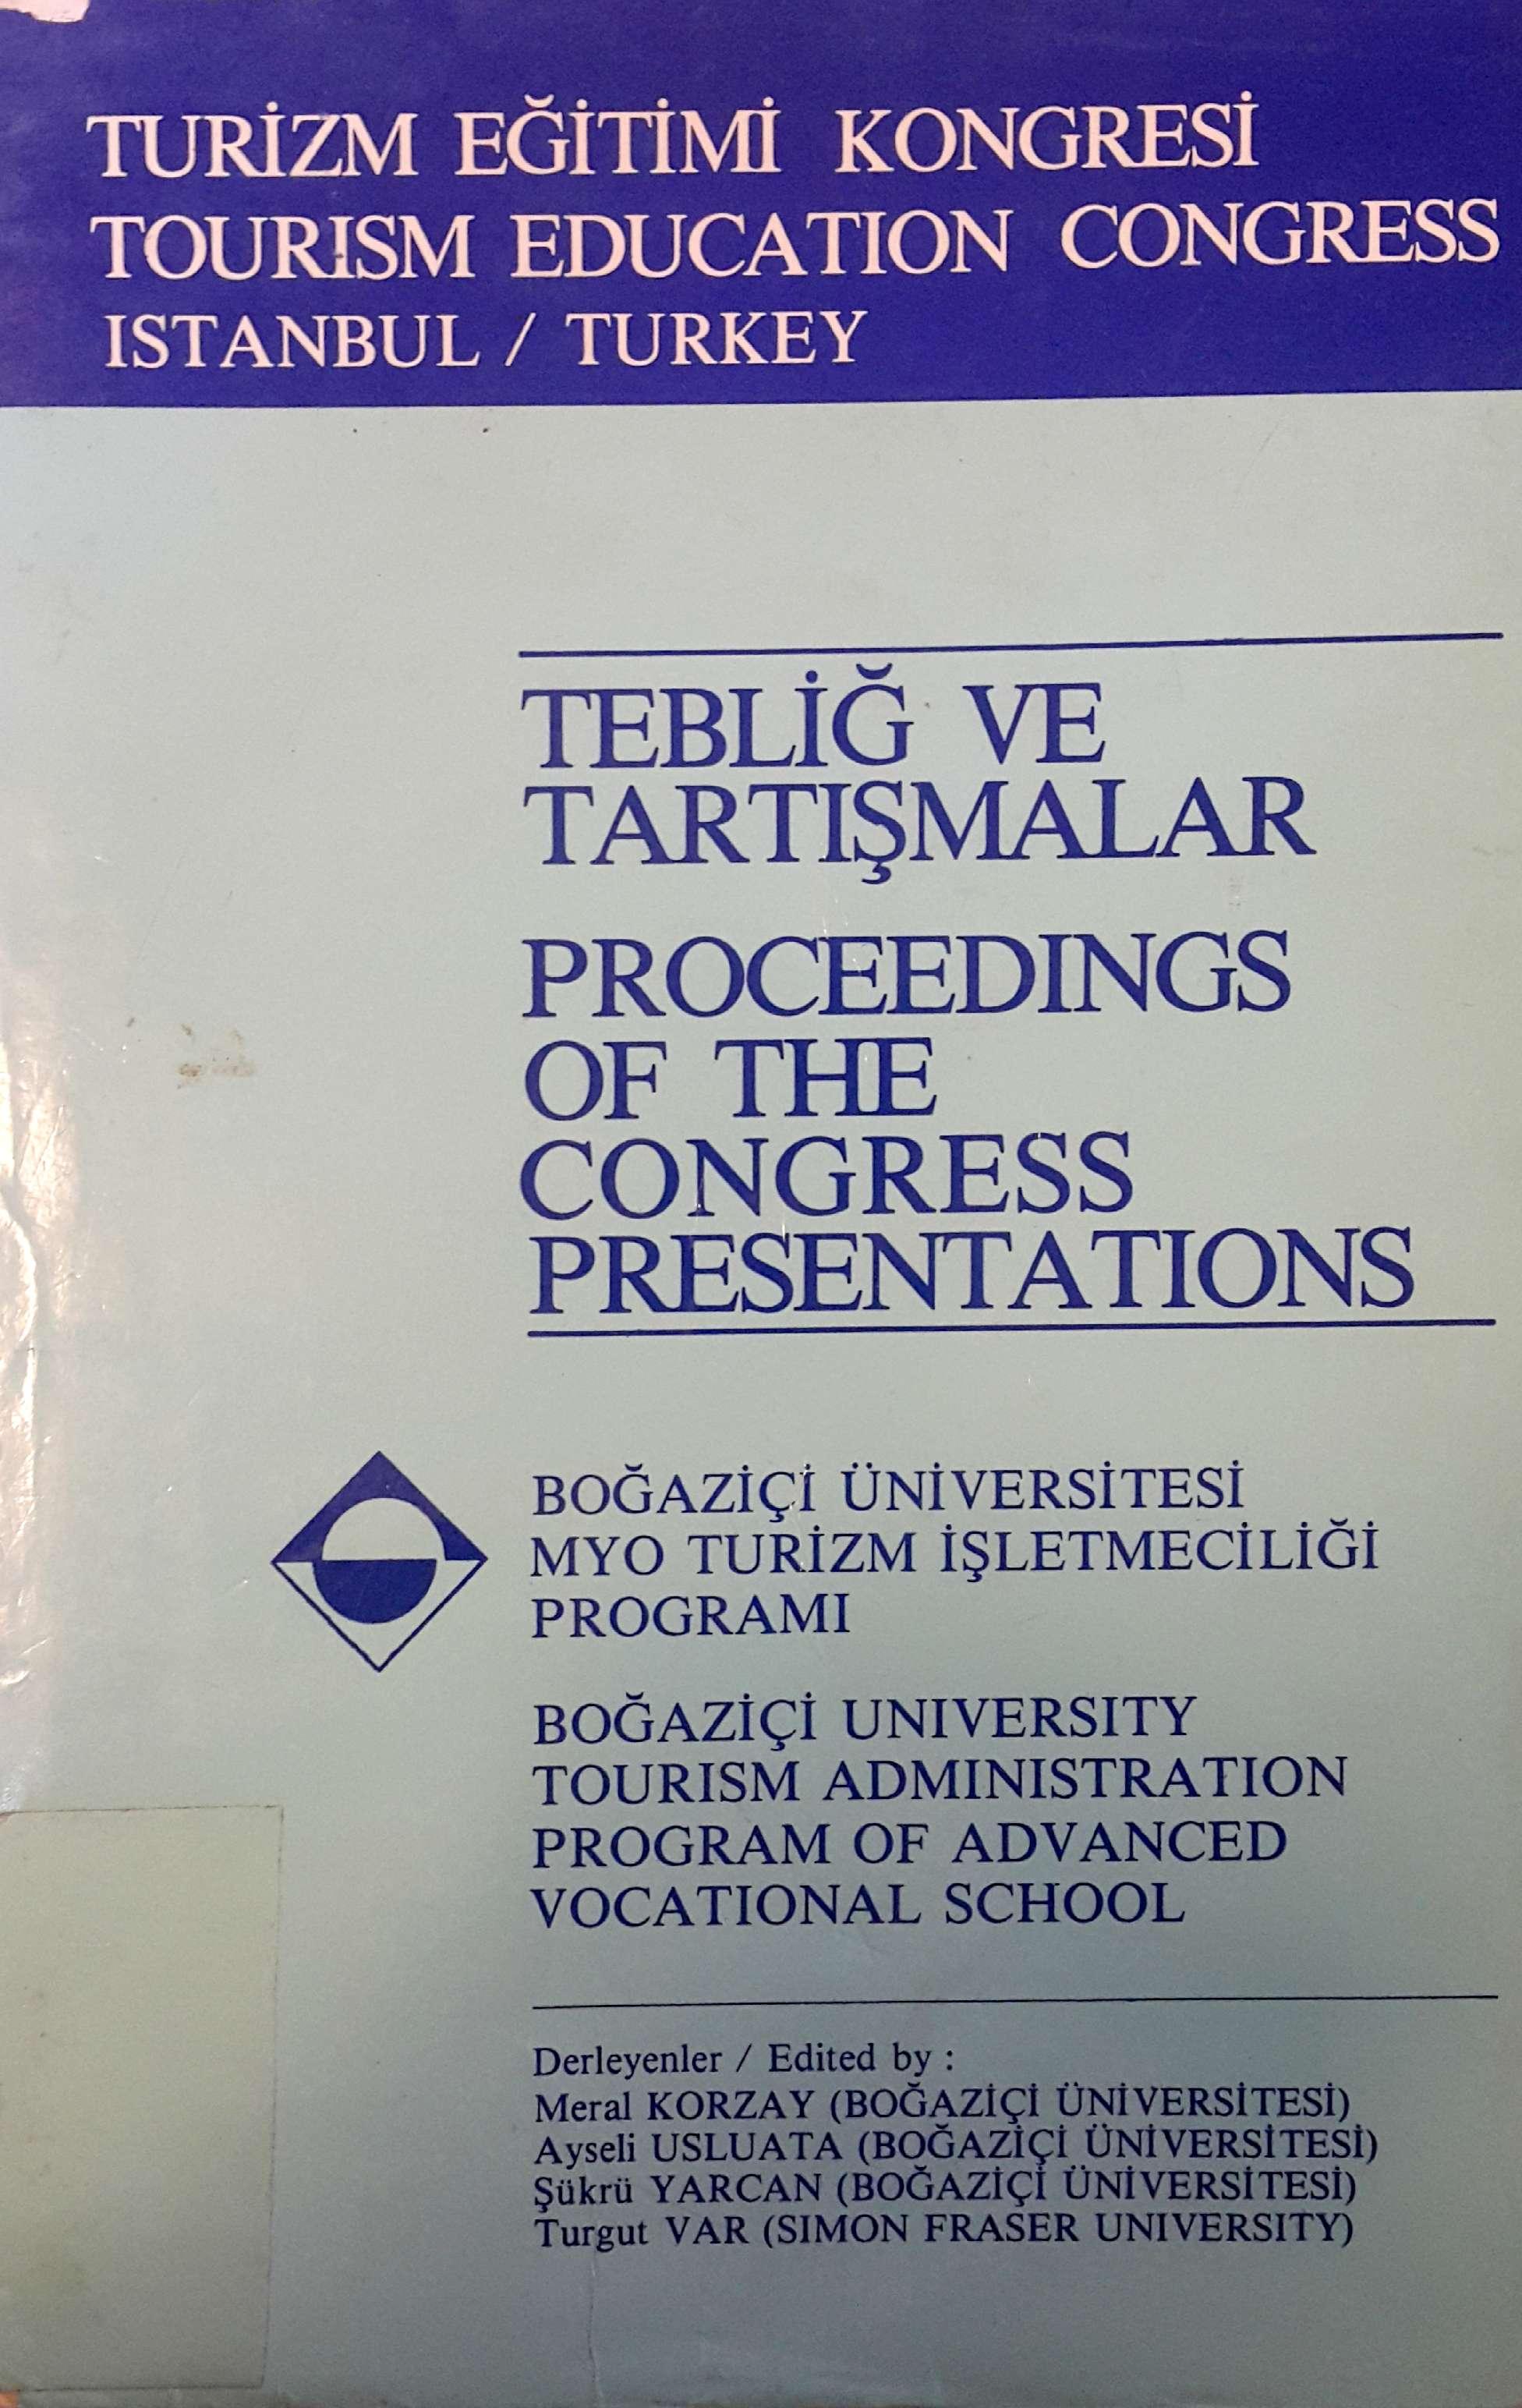 Turizm Eğitimi Kongresi 1984 Kitap Kapağı